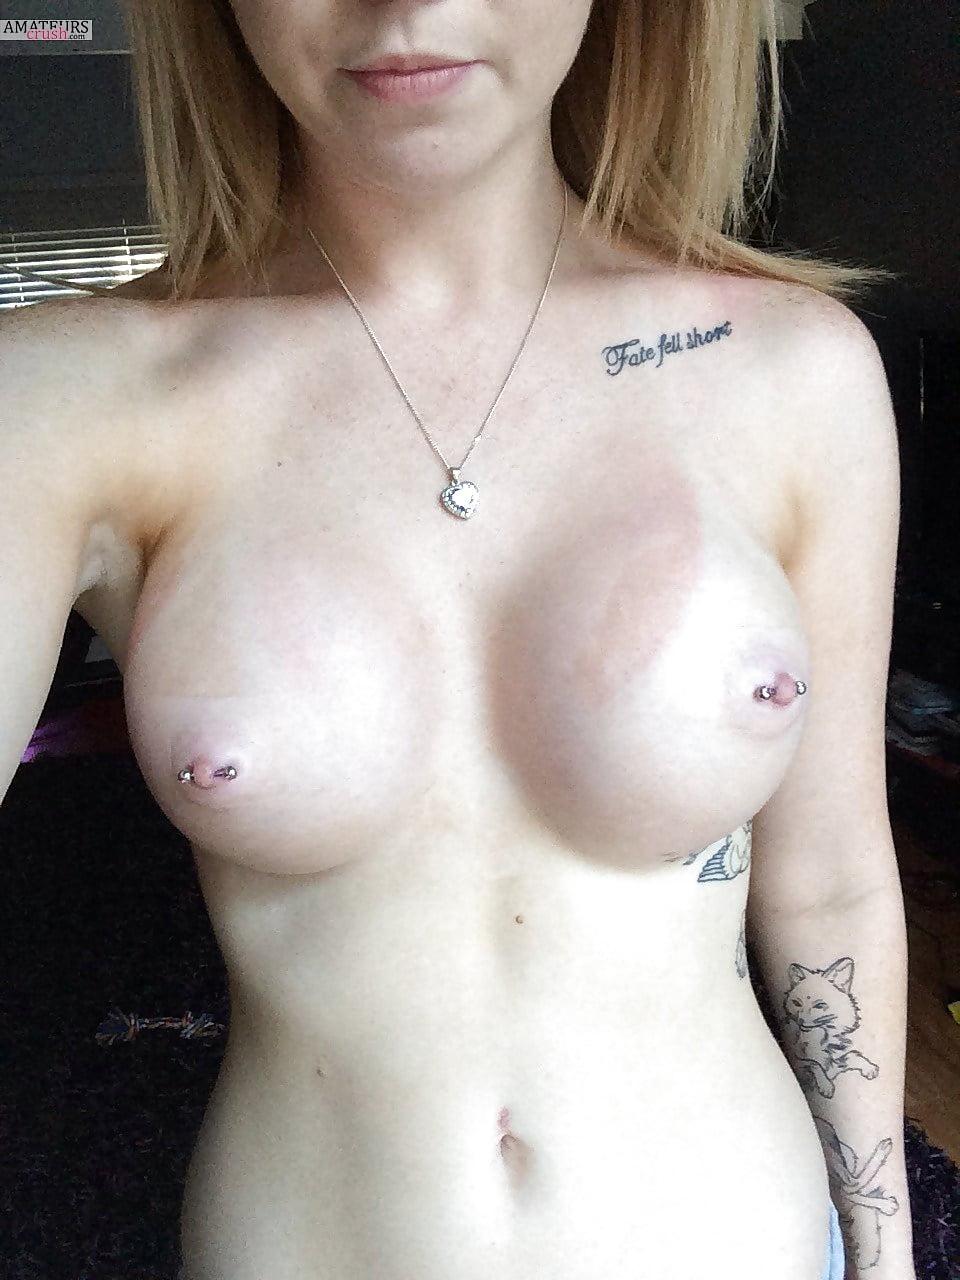 Nude Teens - 14 Pics - Xhamstercom-8560